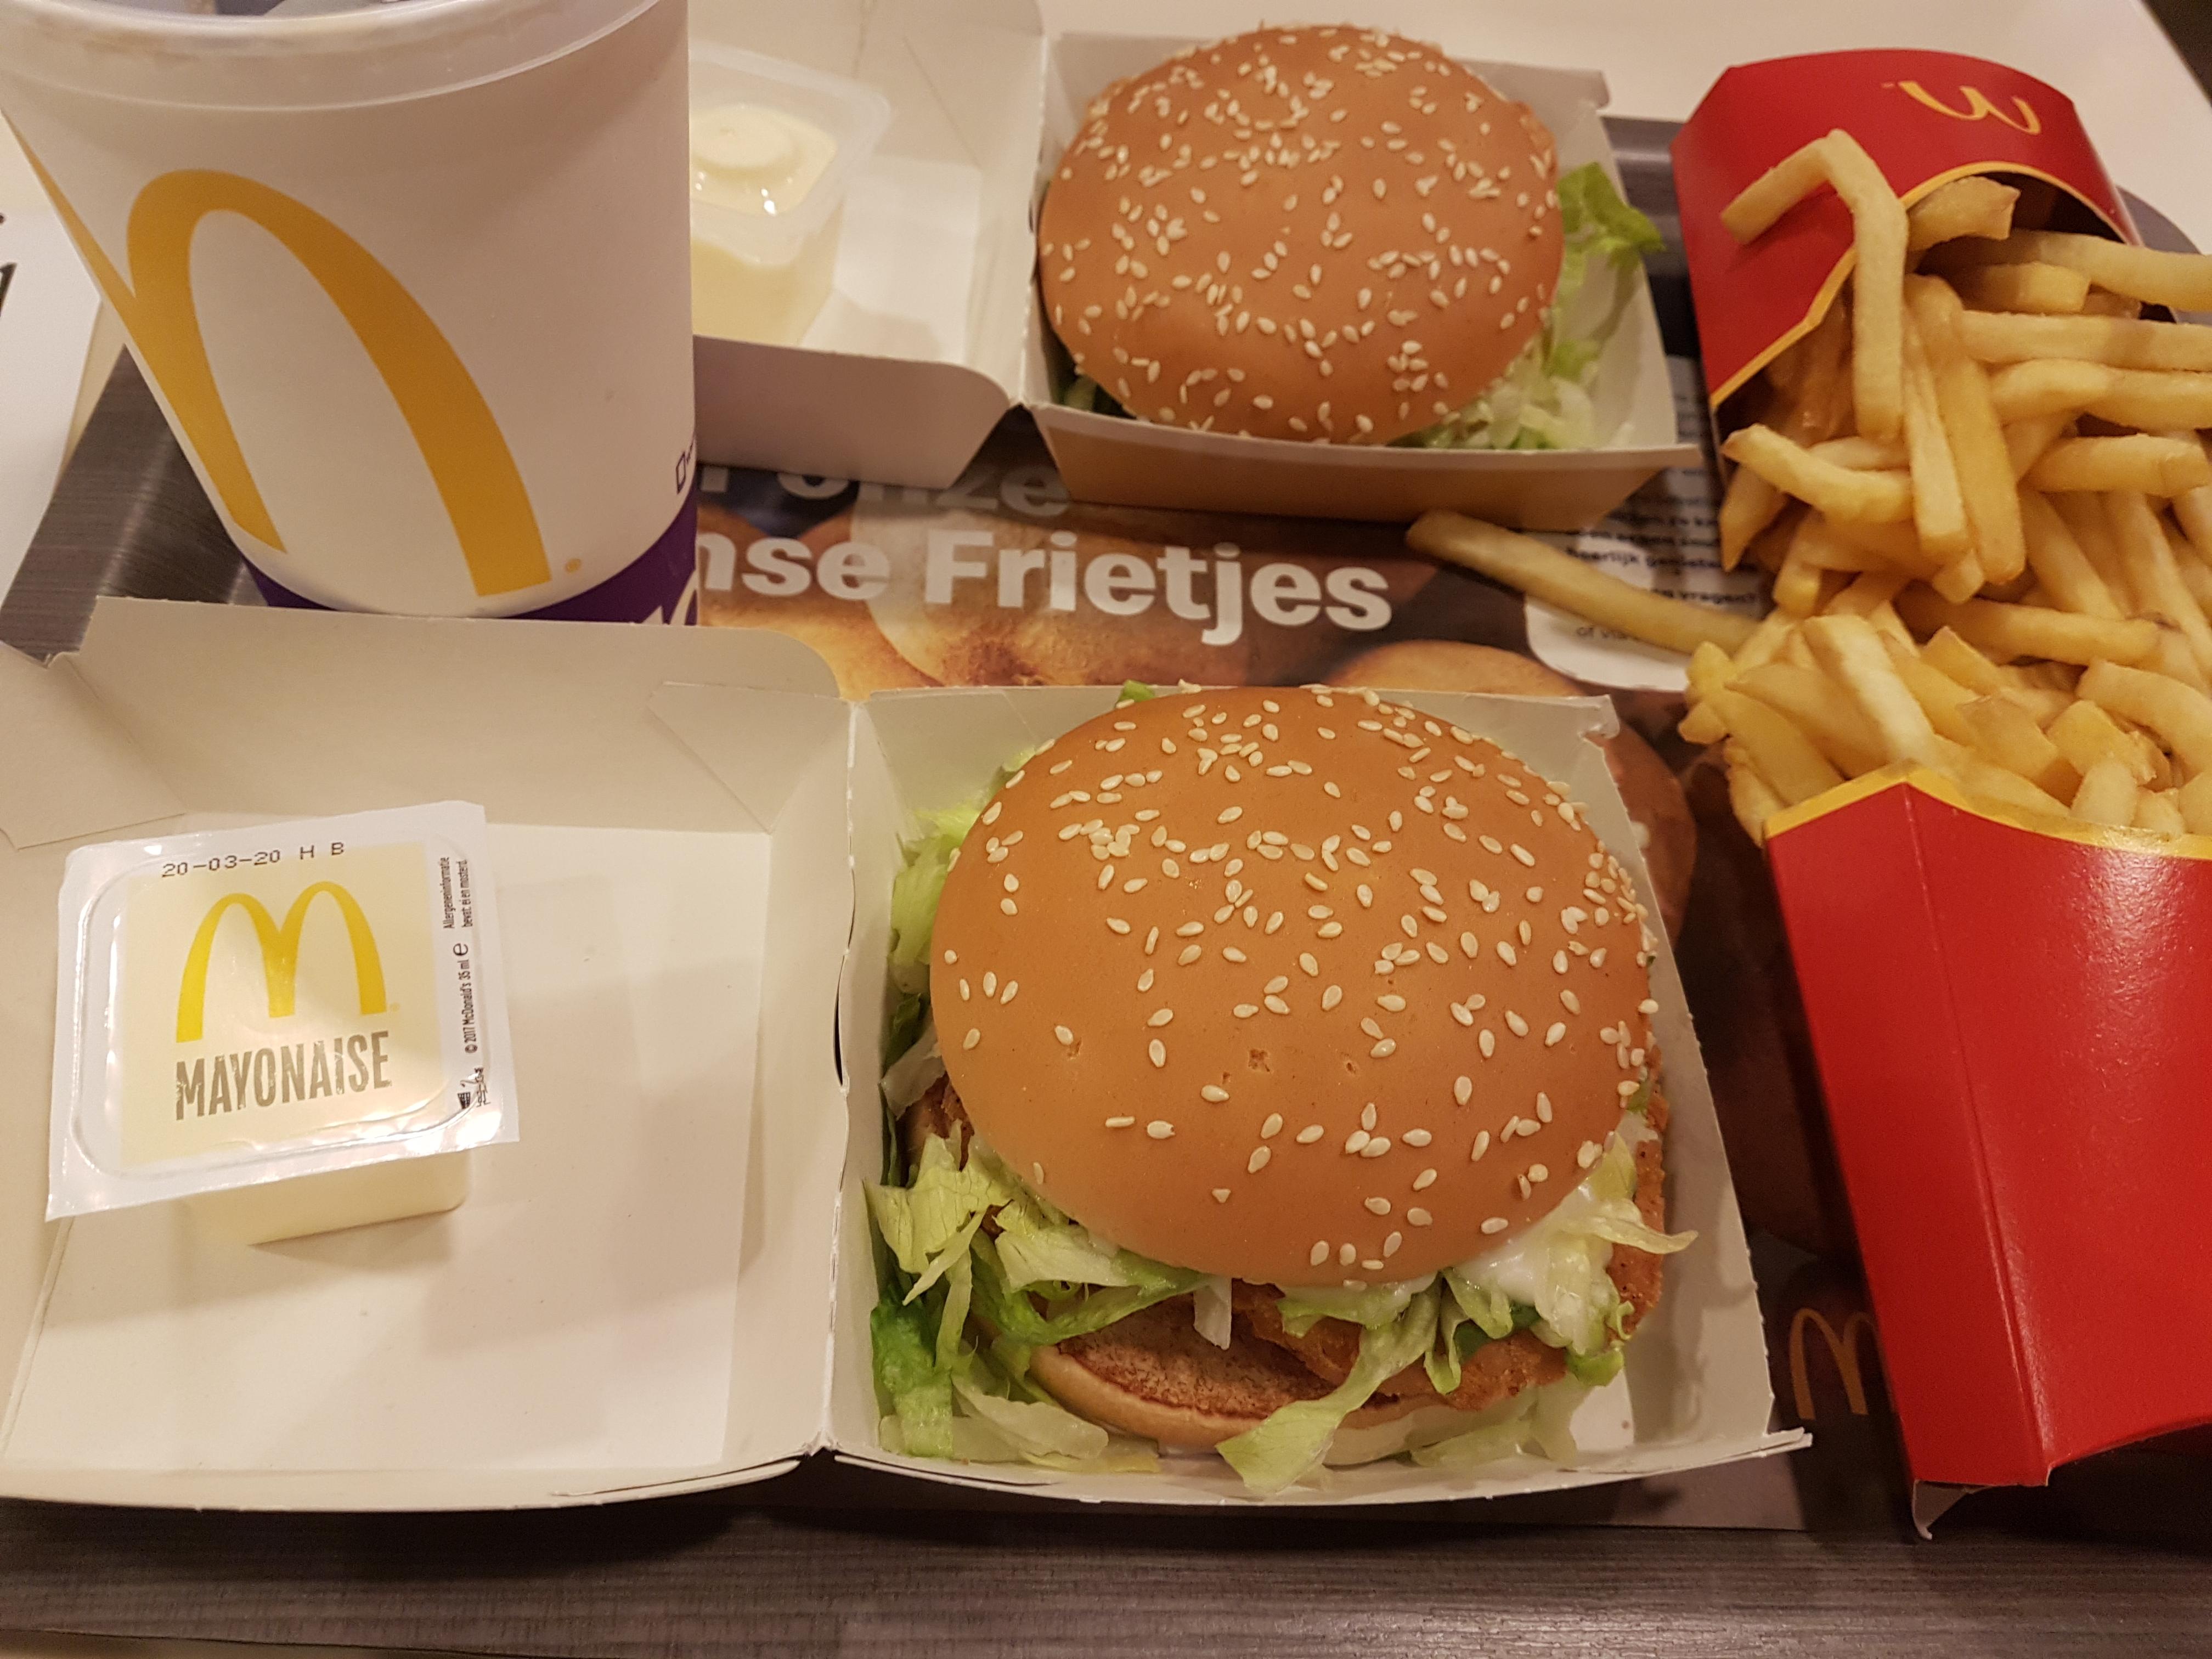 https://foodloader.net/Holz_2019-10-05_McDonalds.jpg